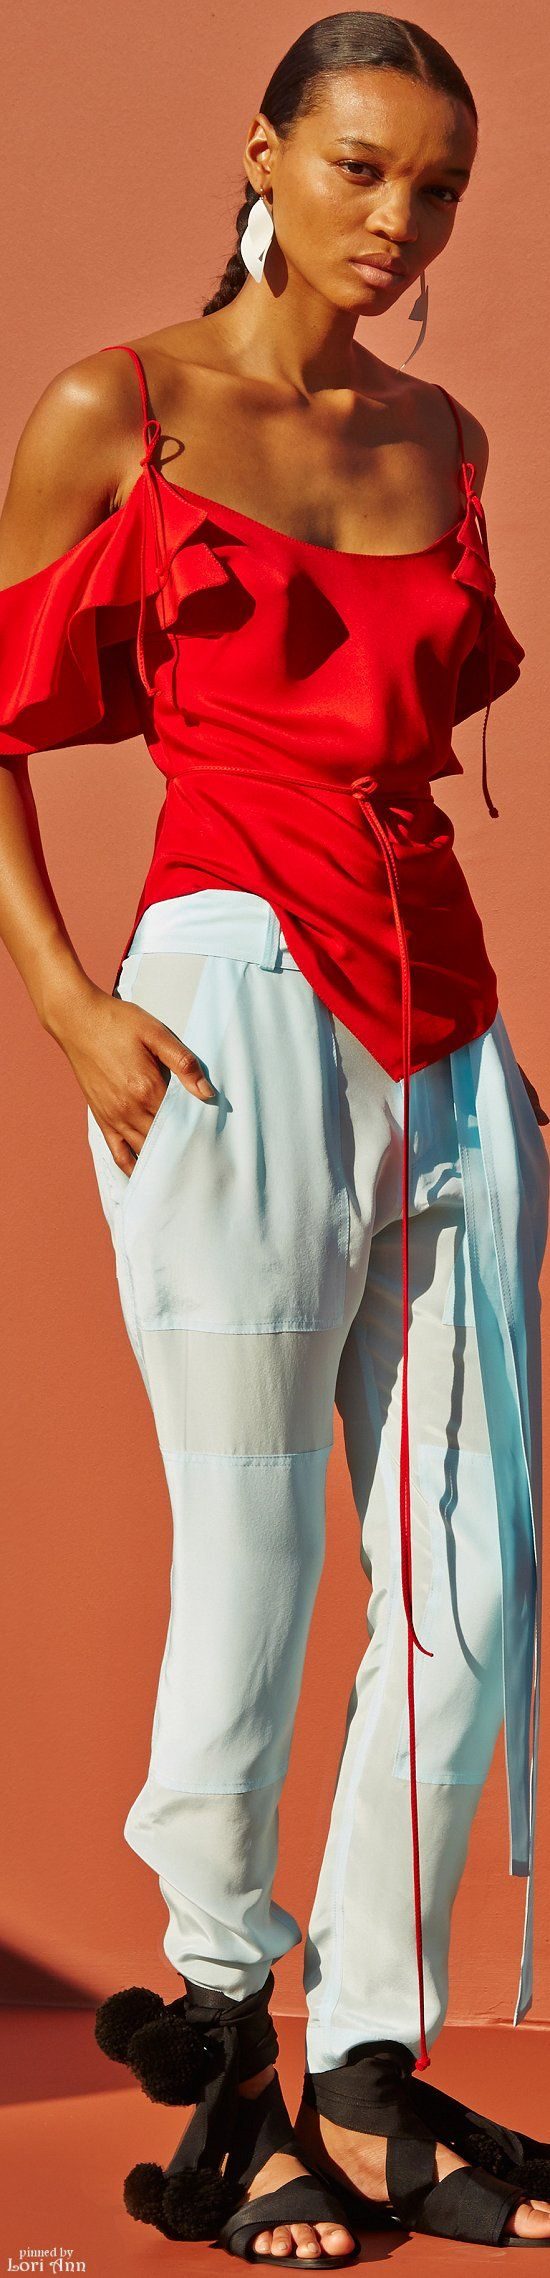 Juan Carlos Obando Spring 2016 RTW women fashion outfit clothing style apparel @roressclothes closet ideas